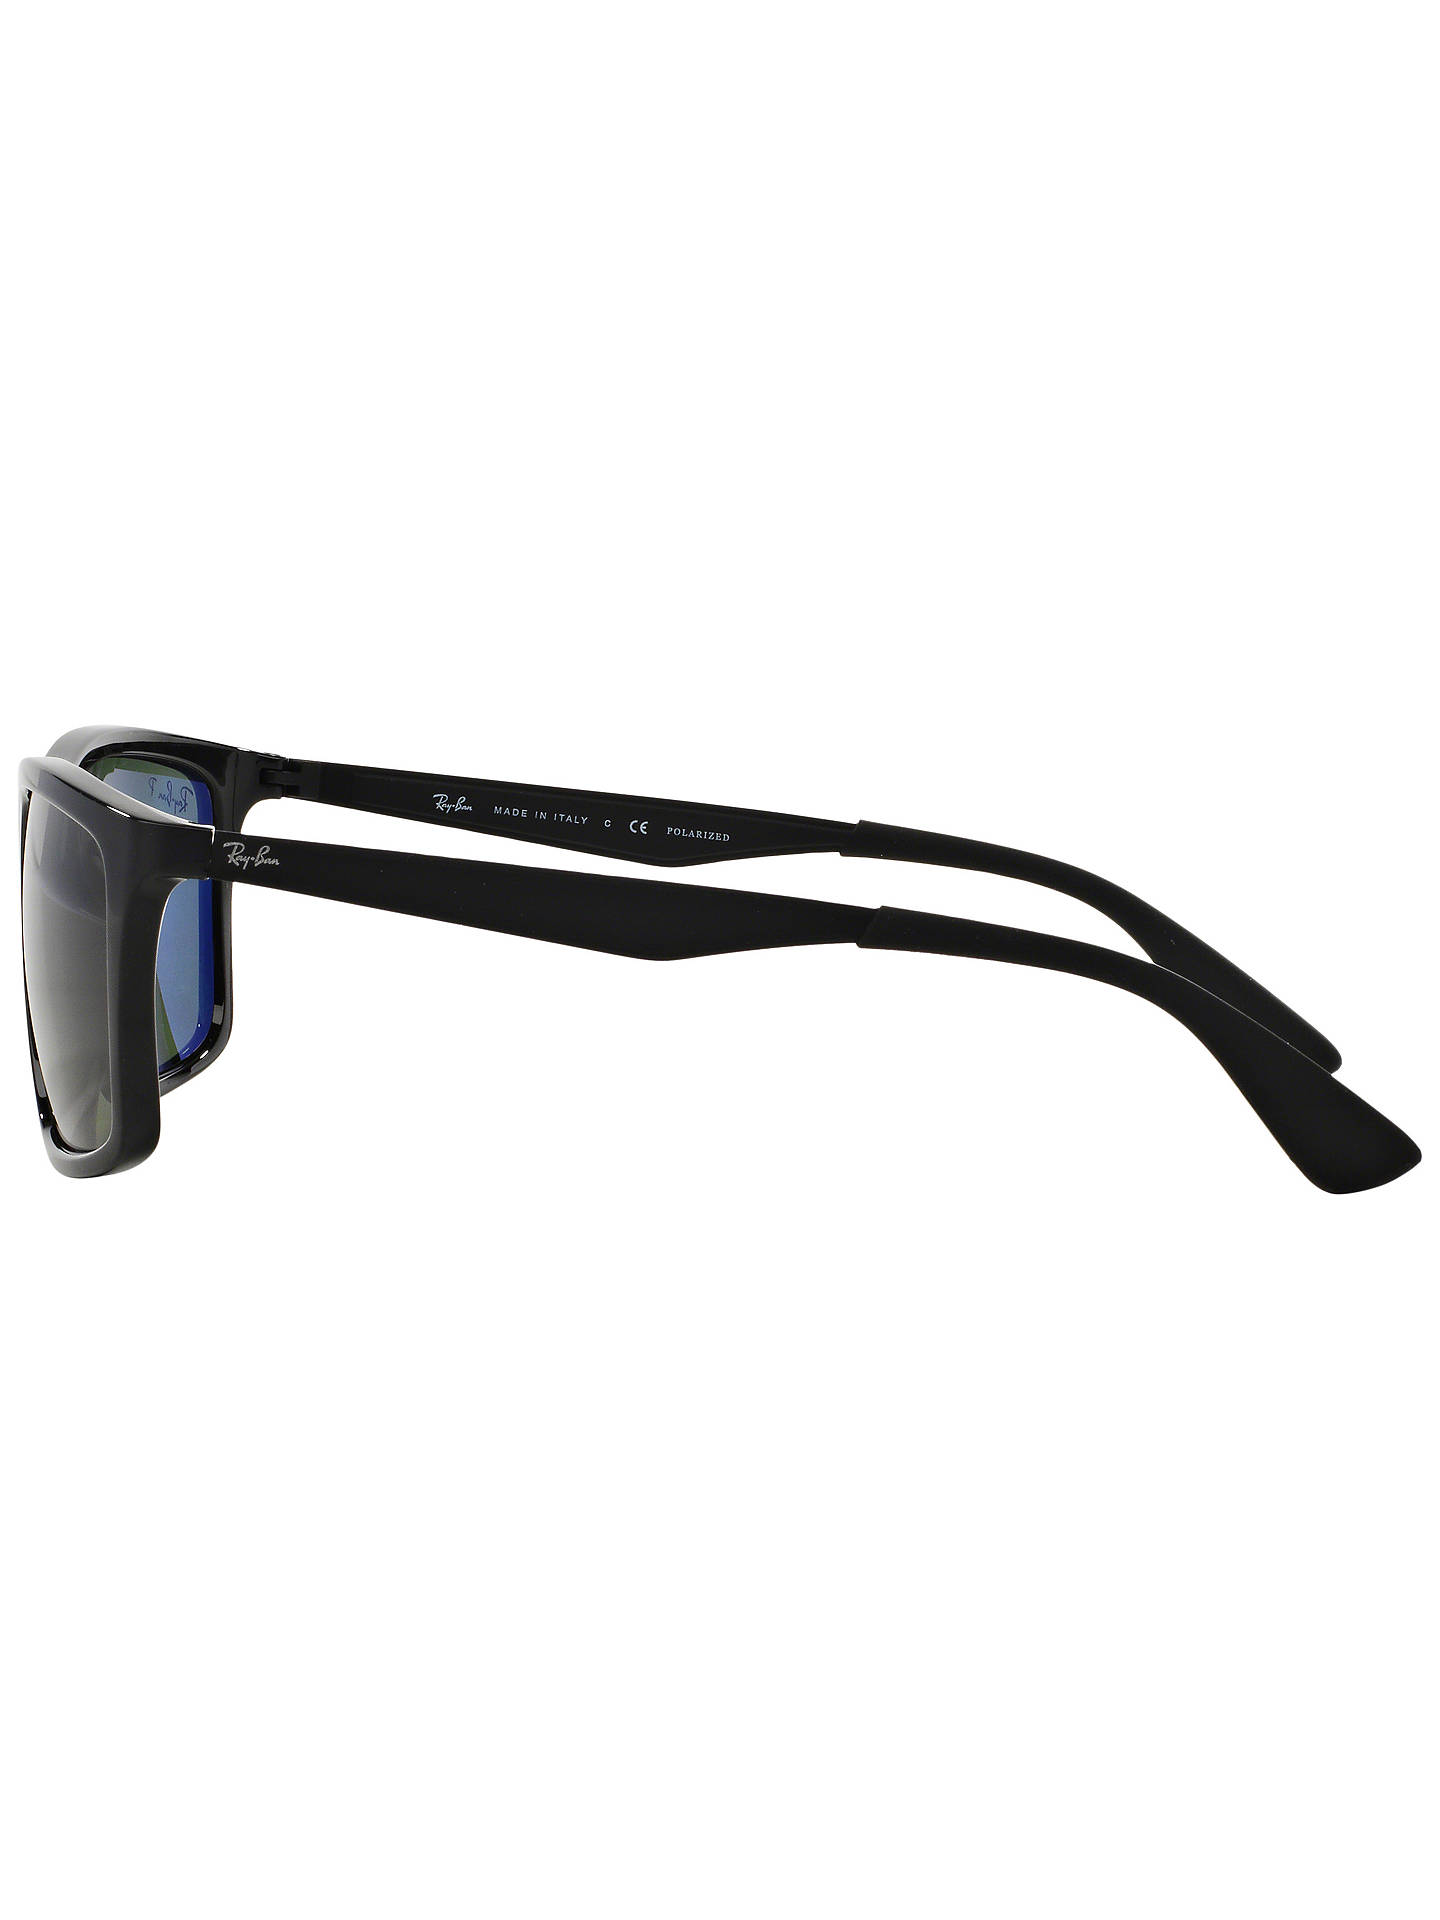 1a5b0db97e Ray-Ban RB4228 Polarised Rectangular Framed Sunglasses at John Lewis ...